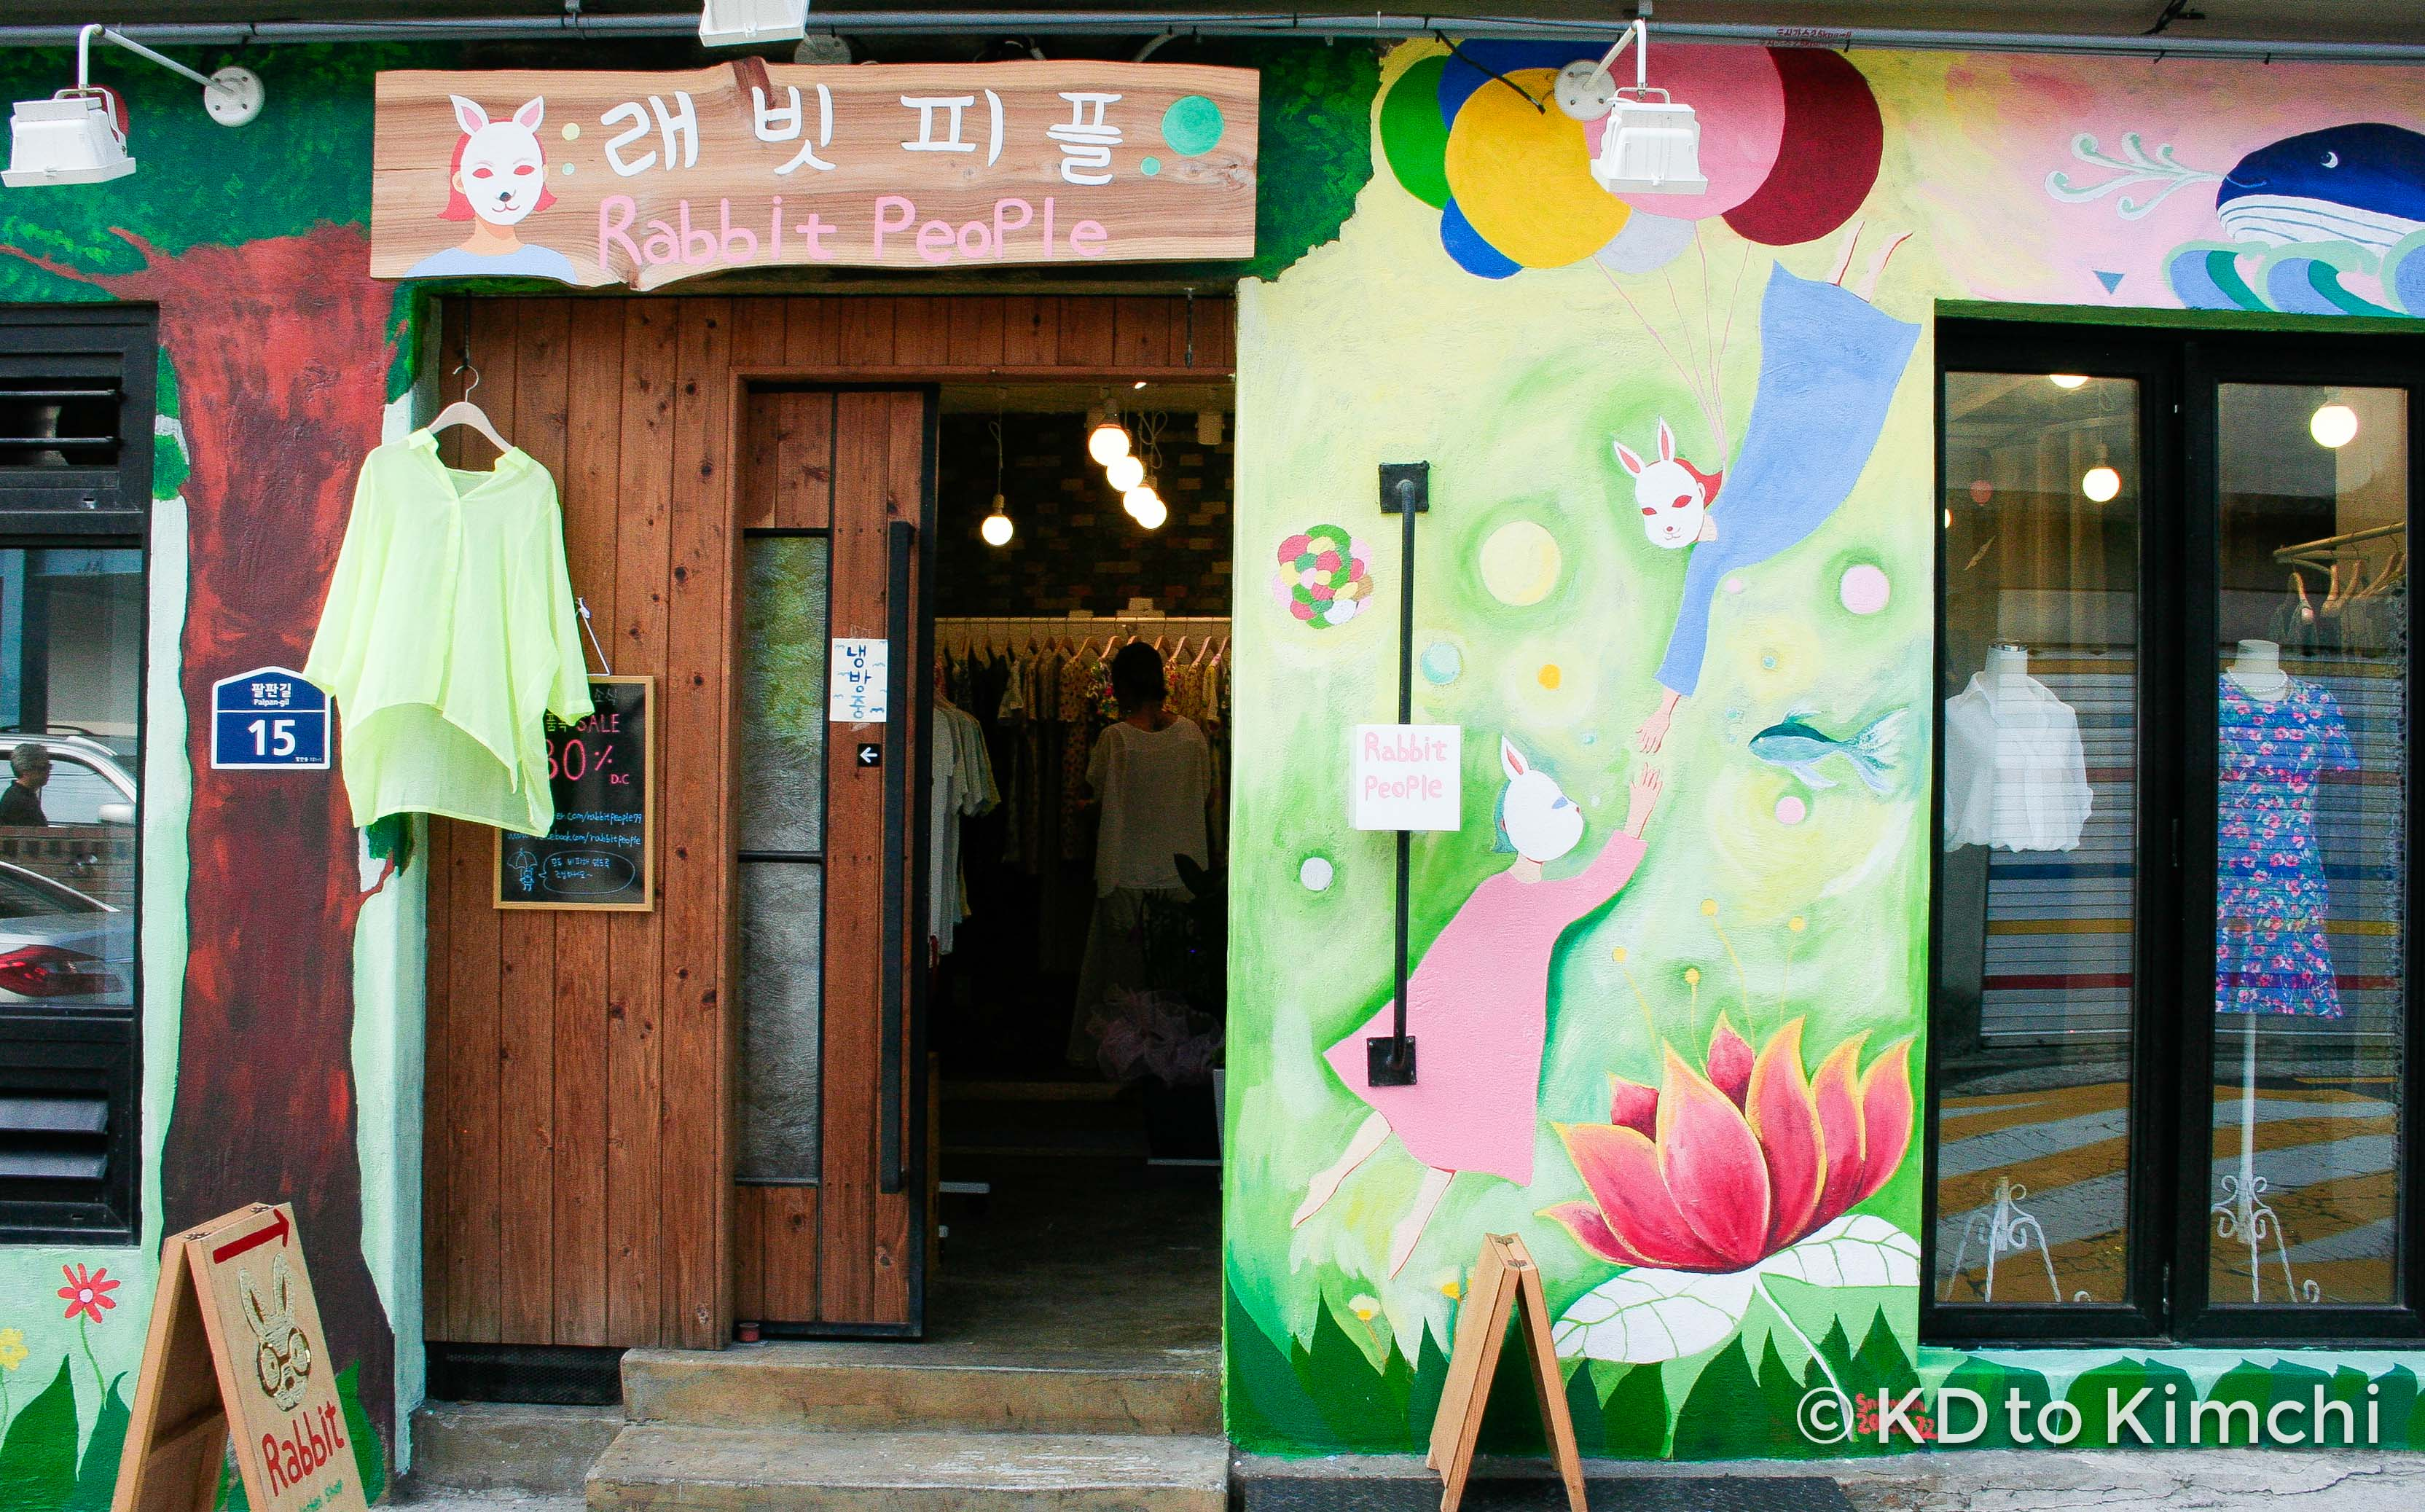 A Stroll through Samcheong-dong (삼청동)